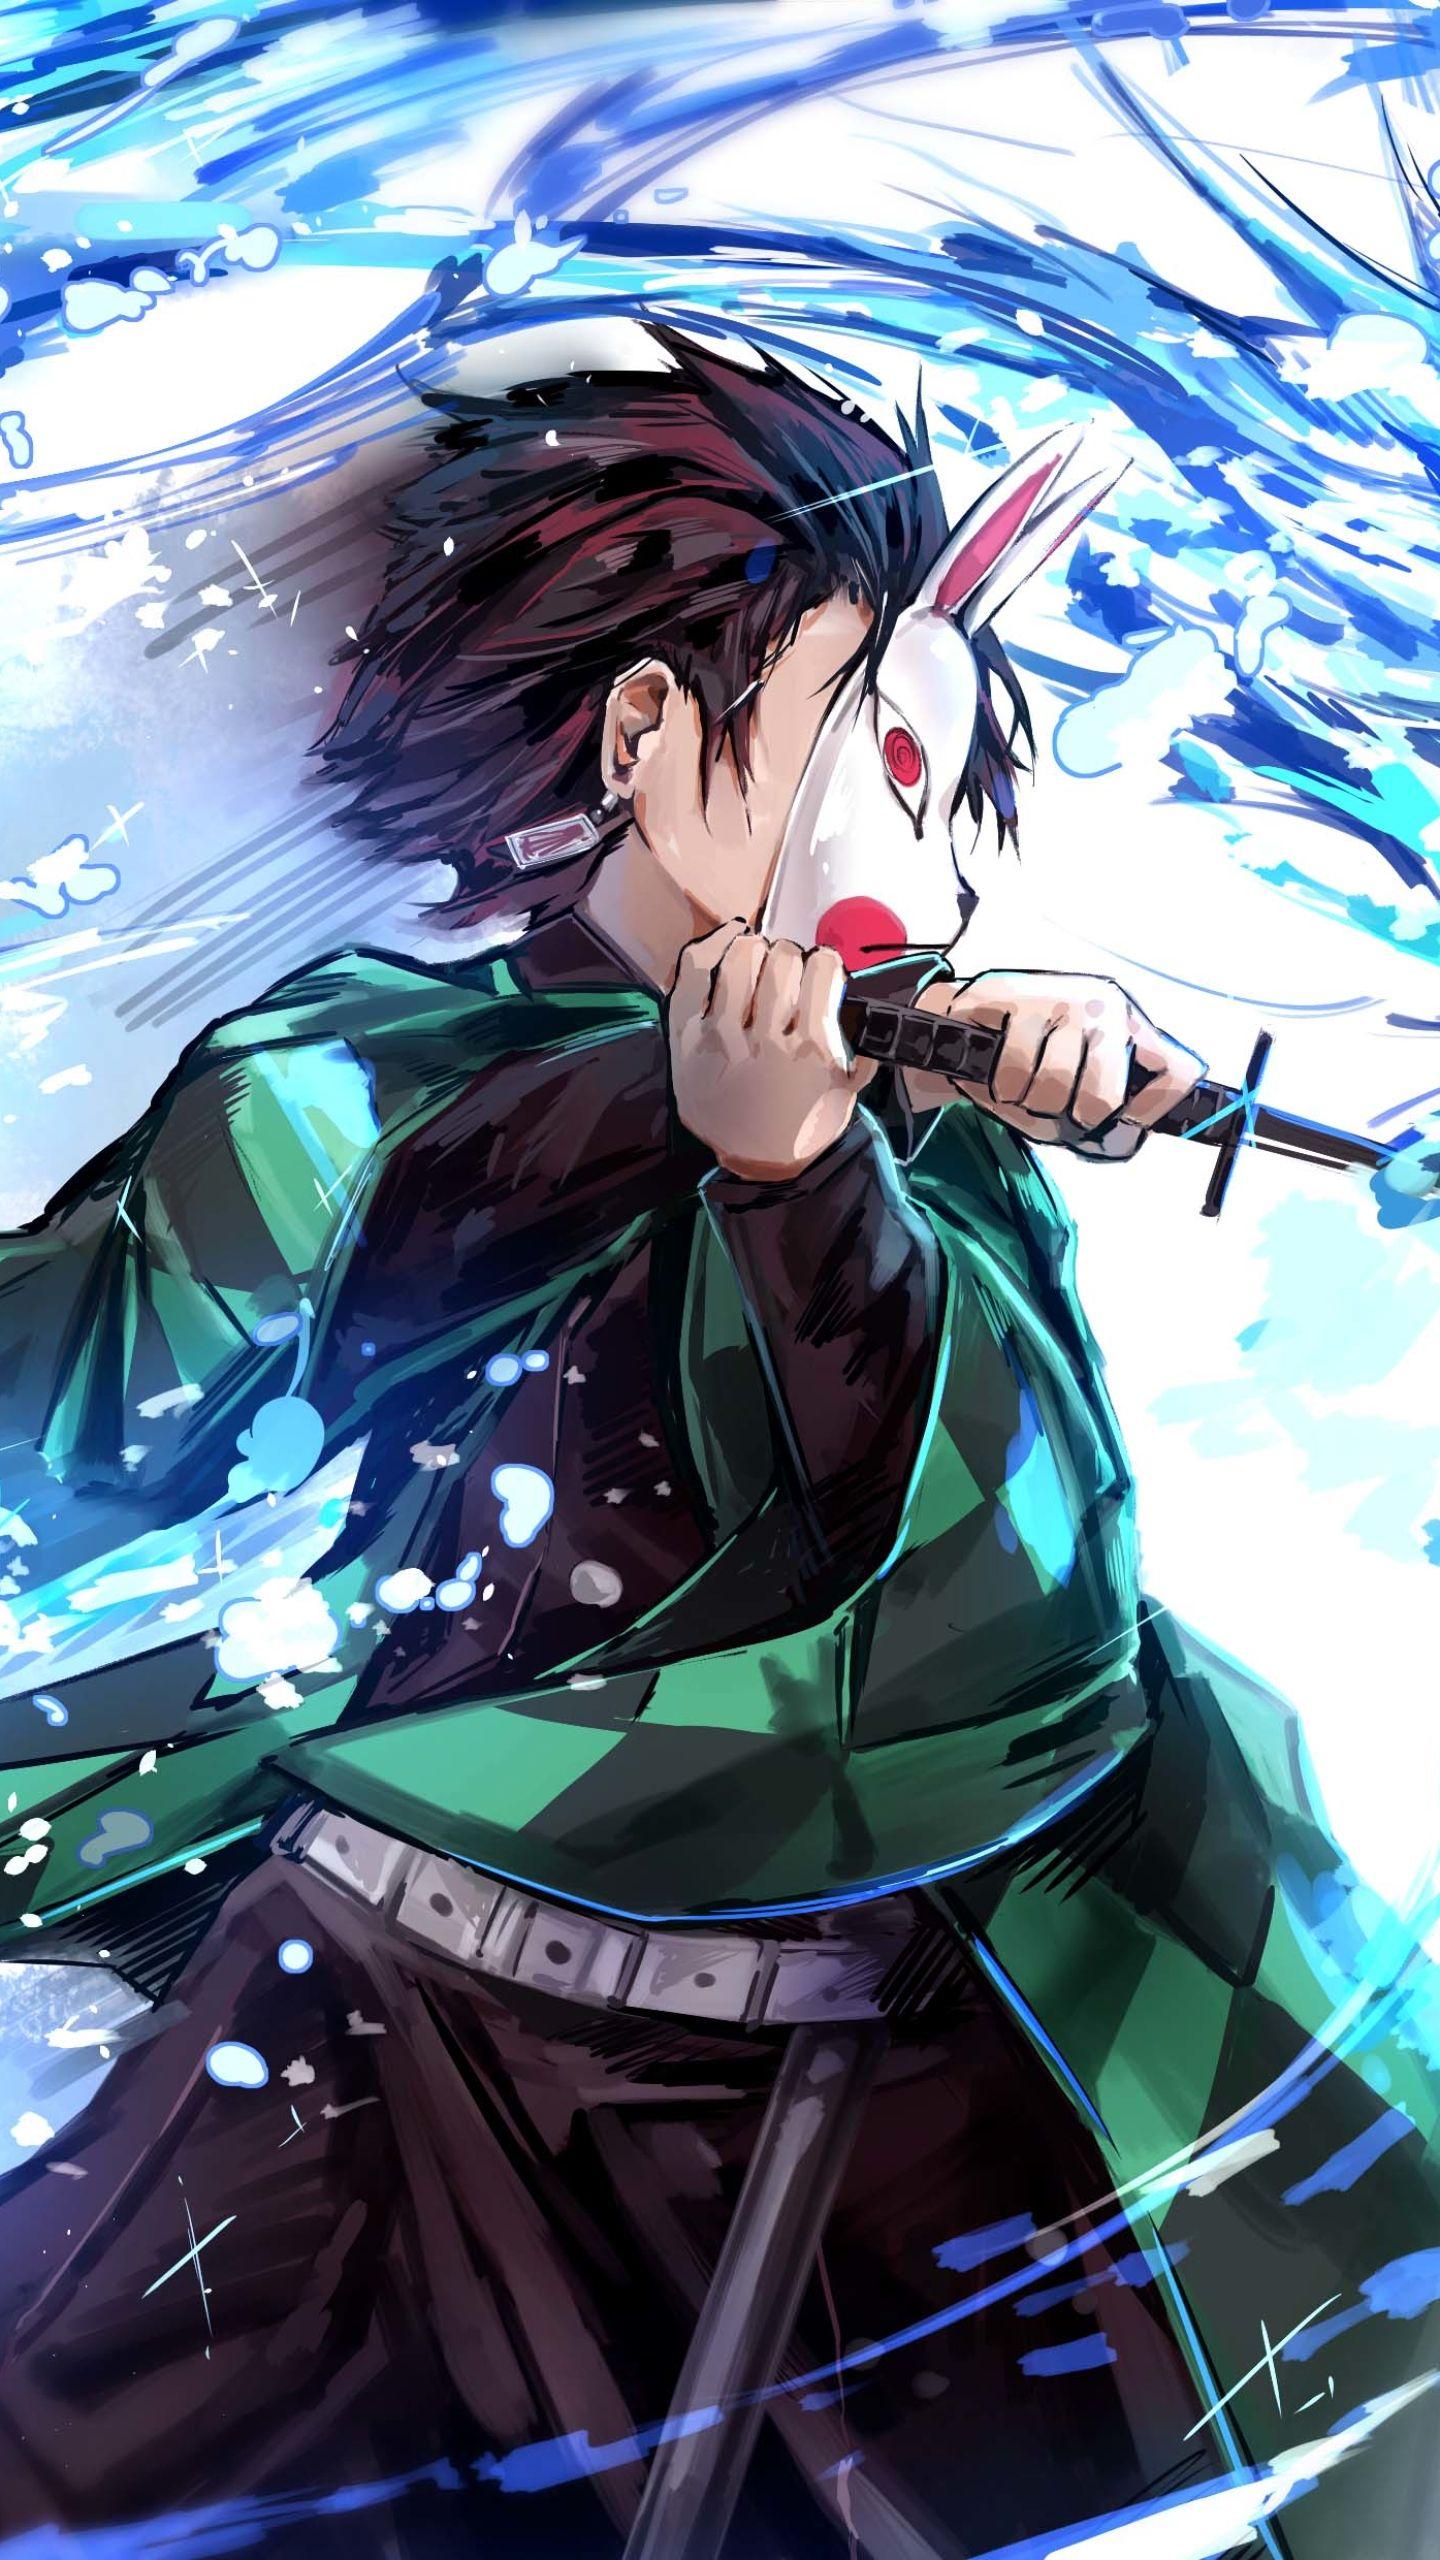 Demon Slayer Kimetsu No Yaiba Phone Wallpapers Wallpaper Cave Wallpaper Anime Gambar Manga Gambar